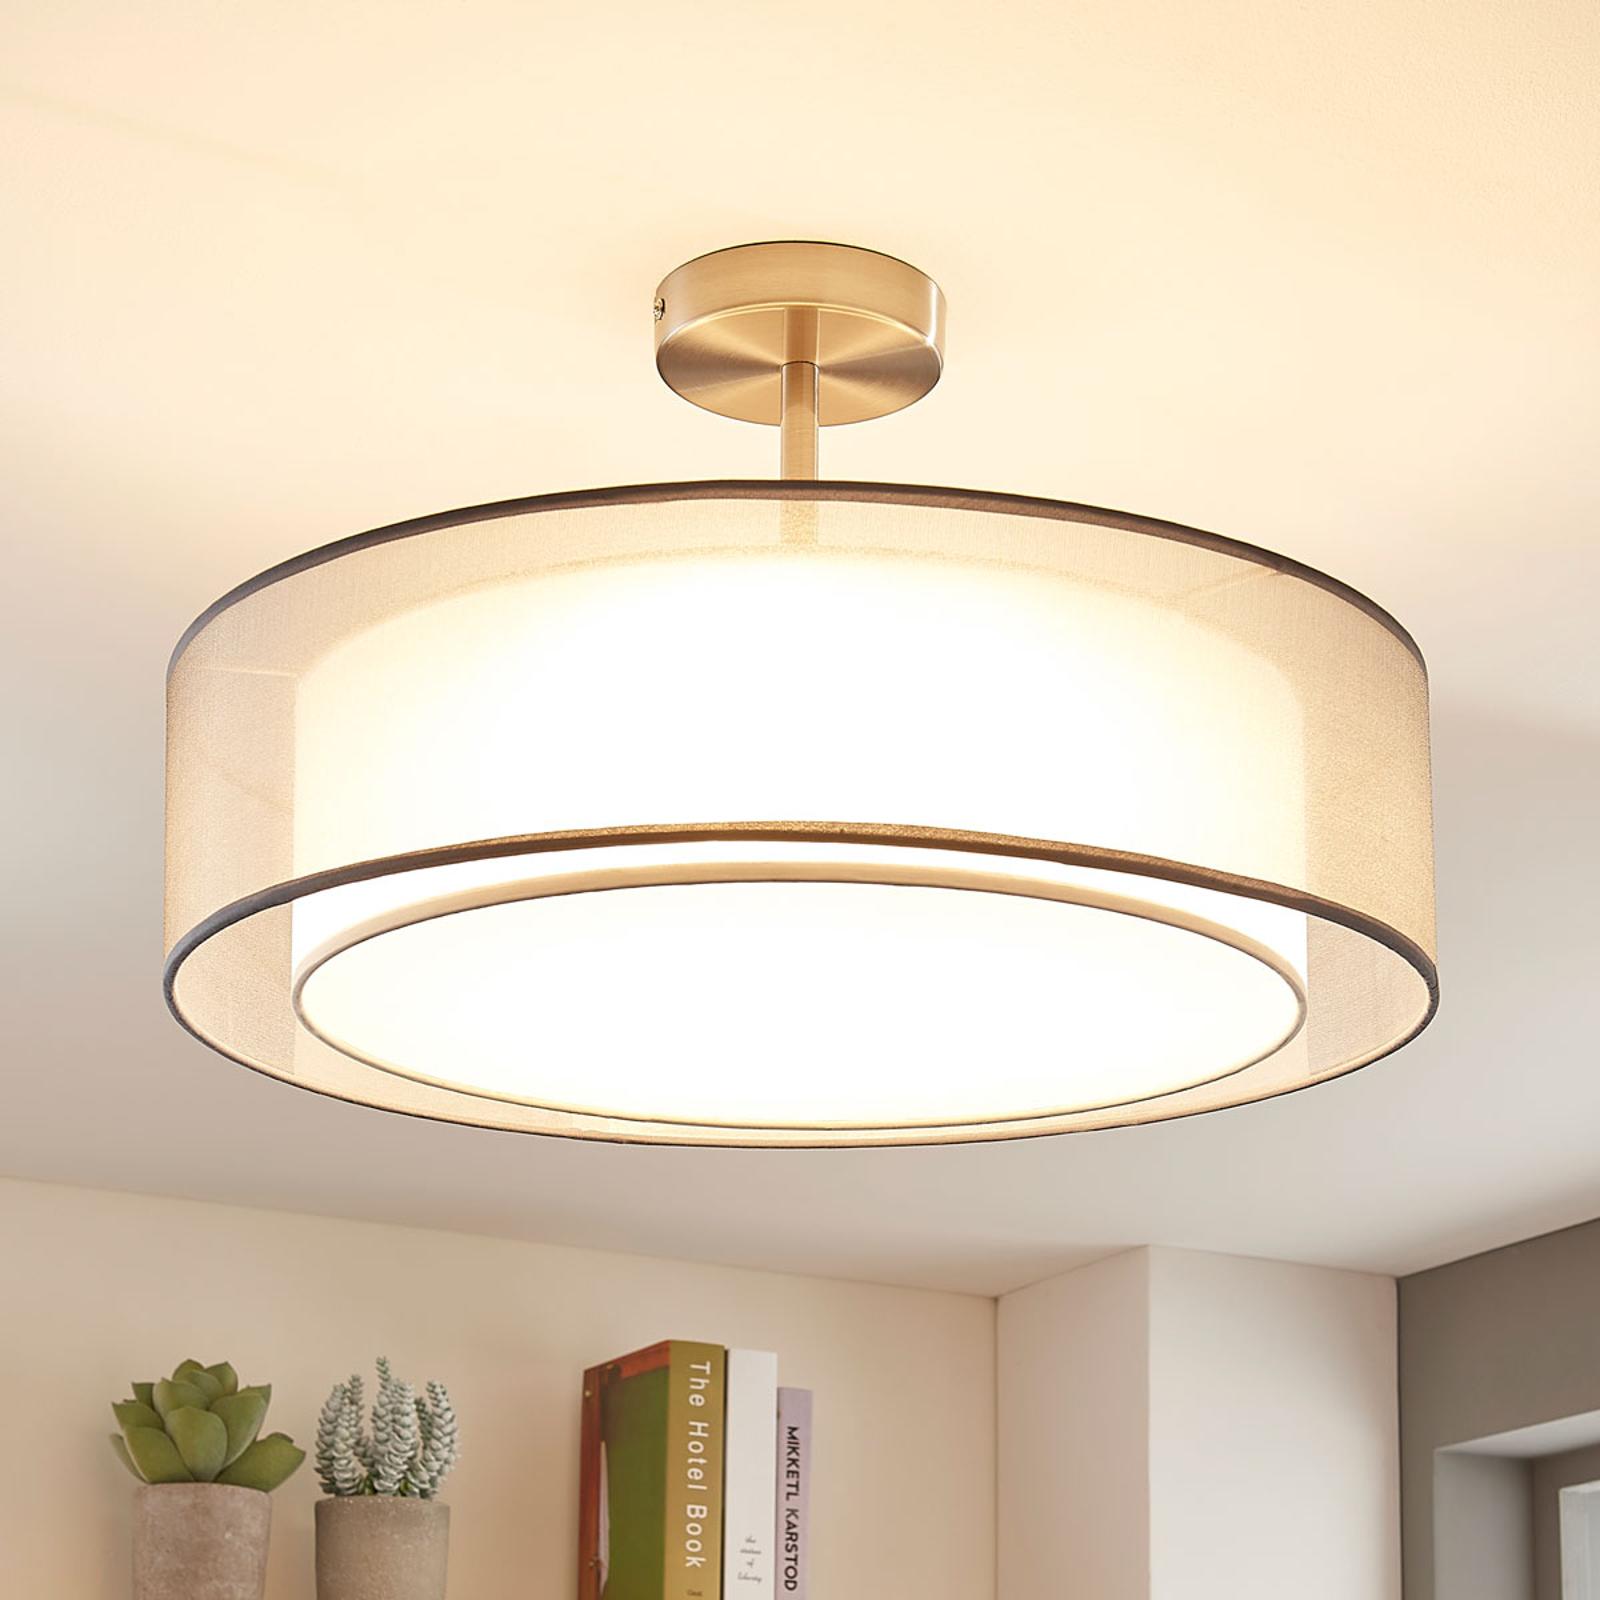 LED-taklampa Pikka, dimbar i 3 steg, grå